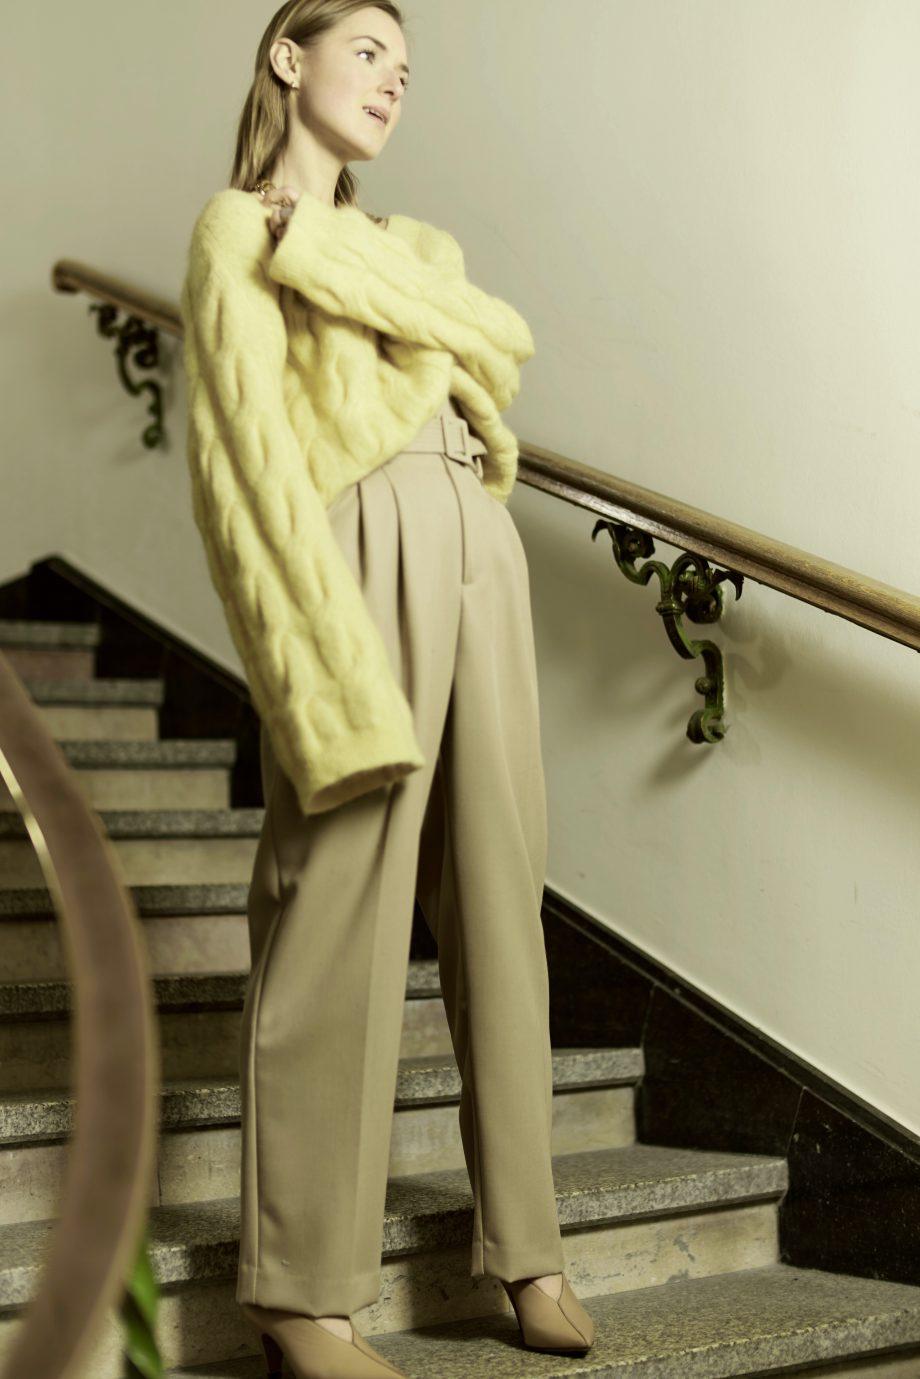 The Yellow Sweater | 13.02.2019